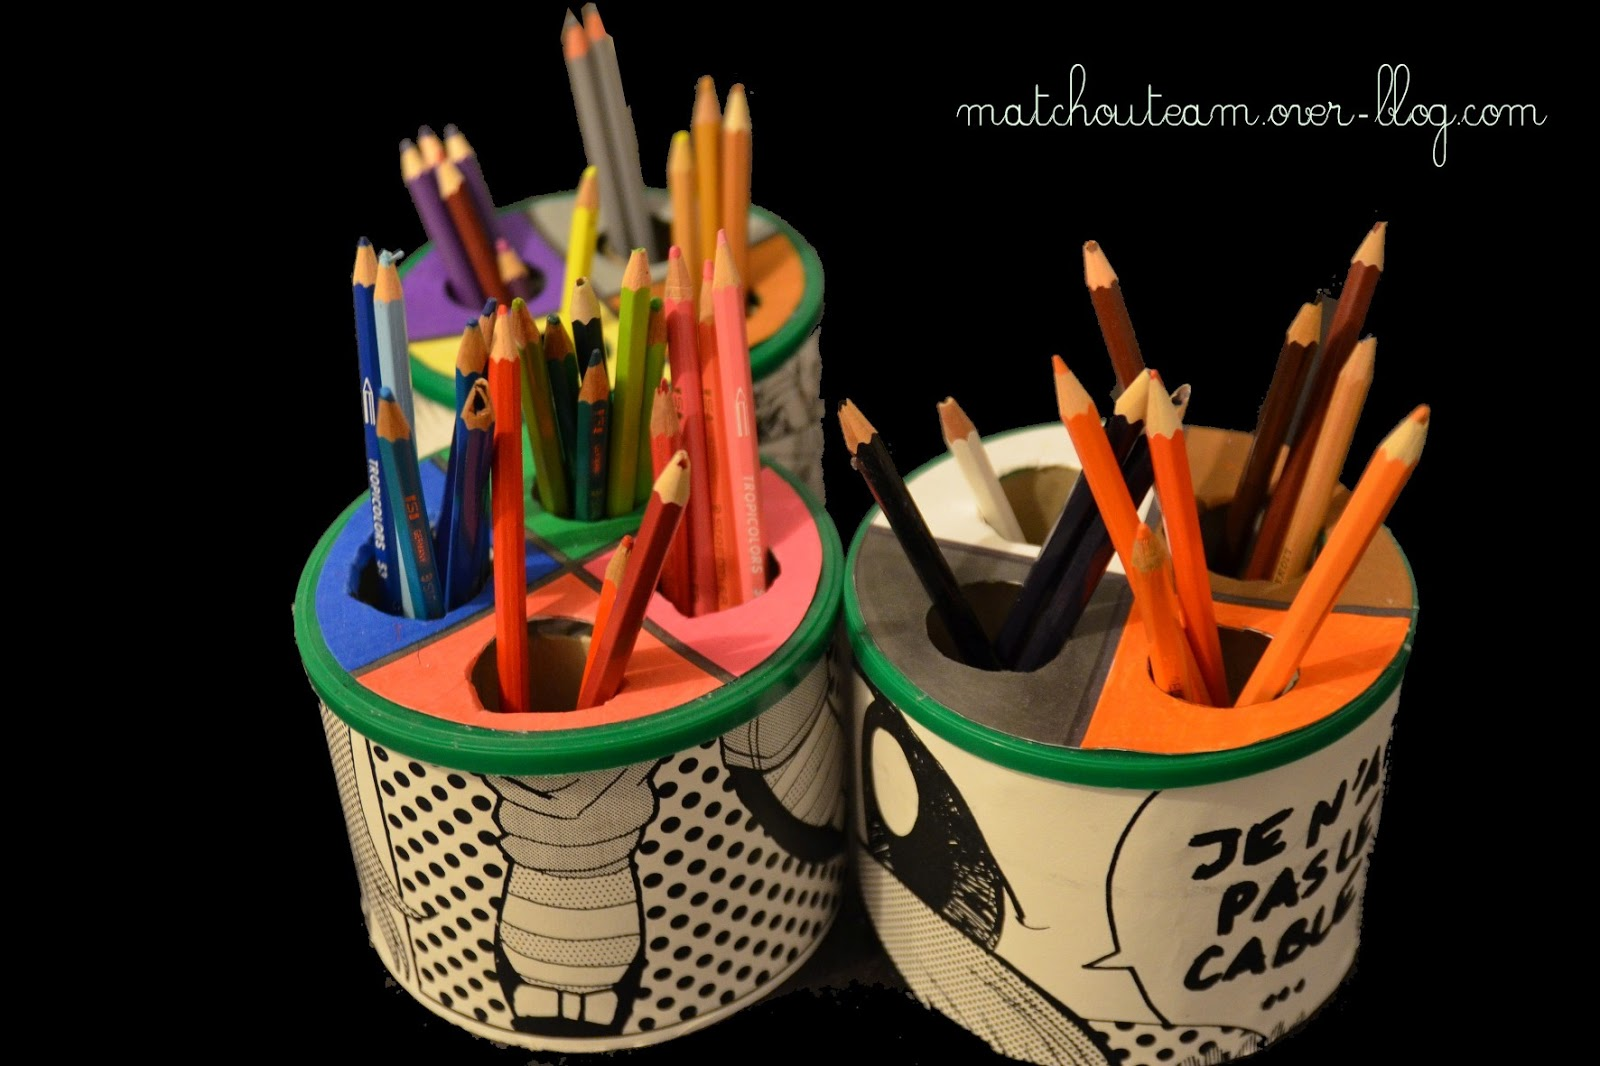 ma tchou team pot crayon organis. Black Bedroom Furniture Sets. Home Design Ideas